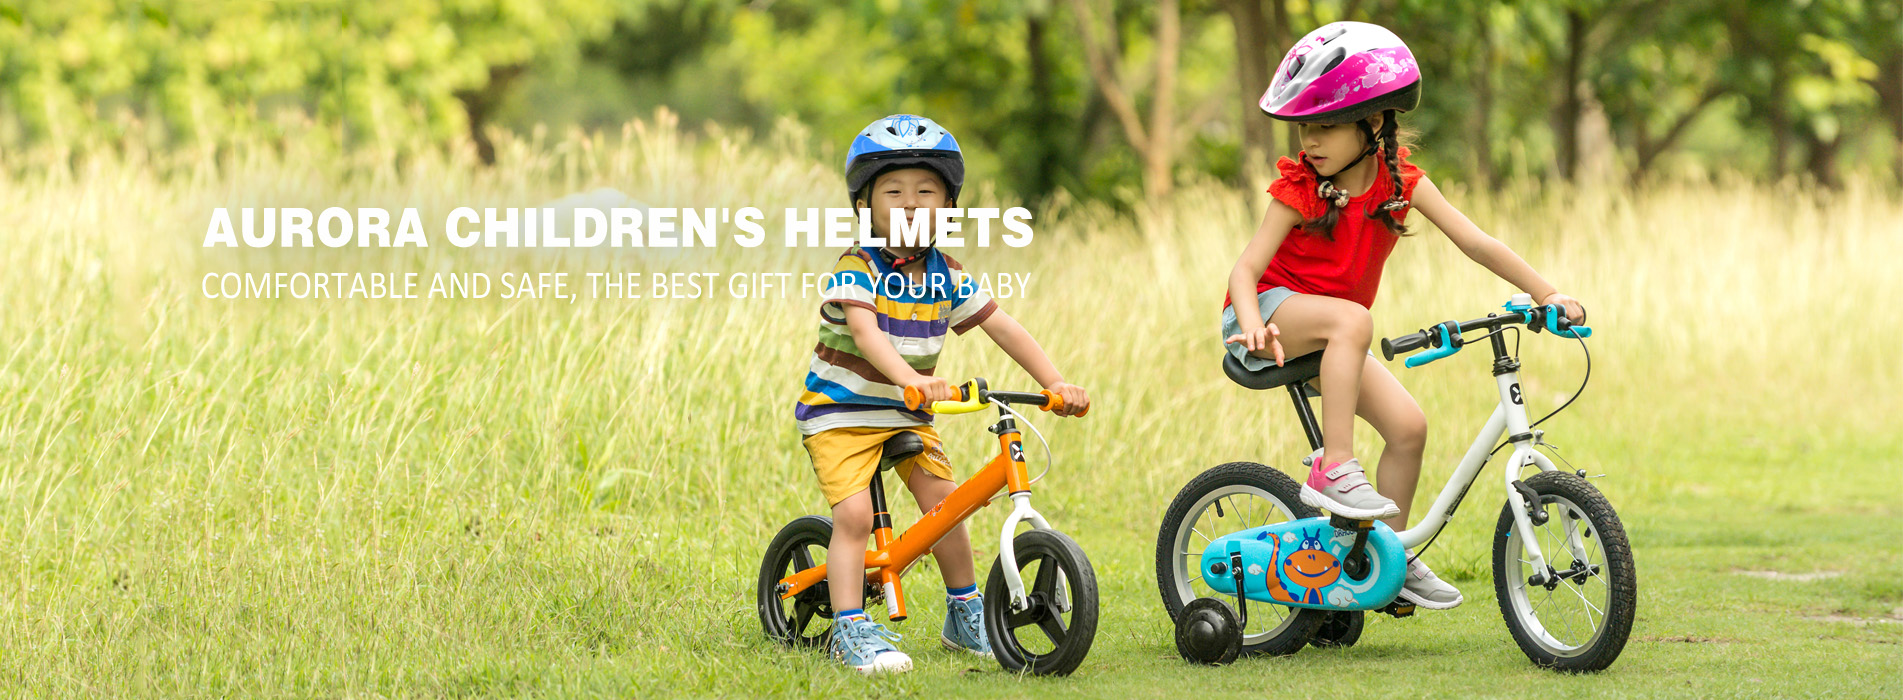 childrens cycle helmet c01 banner